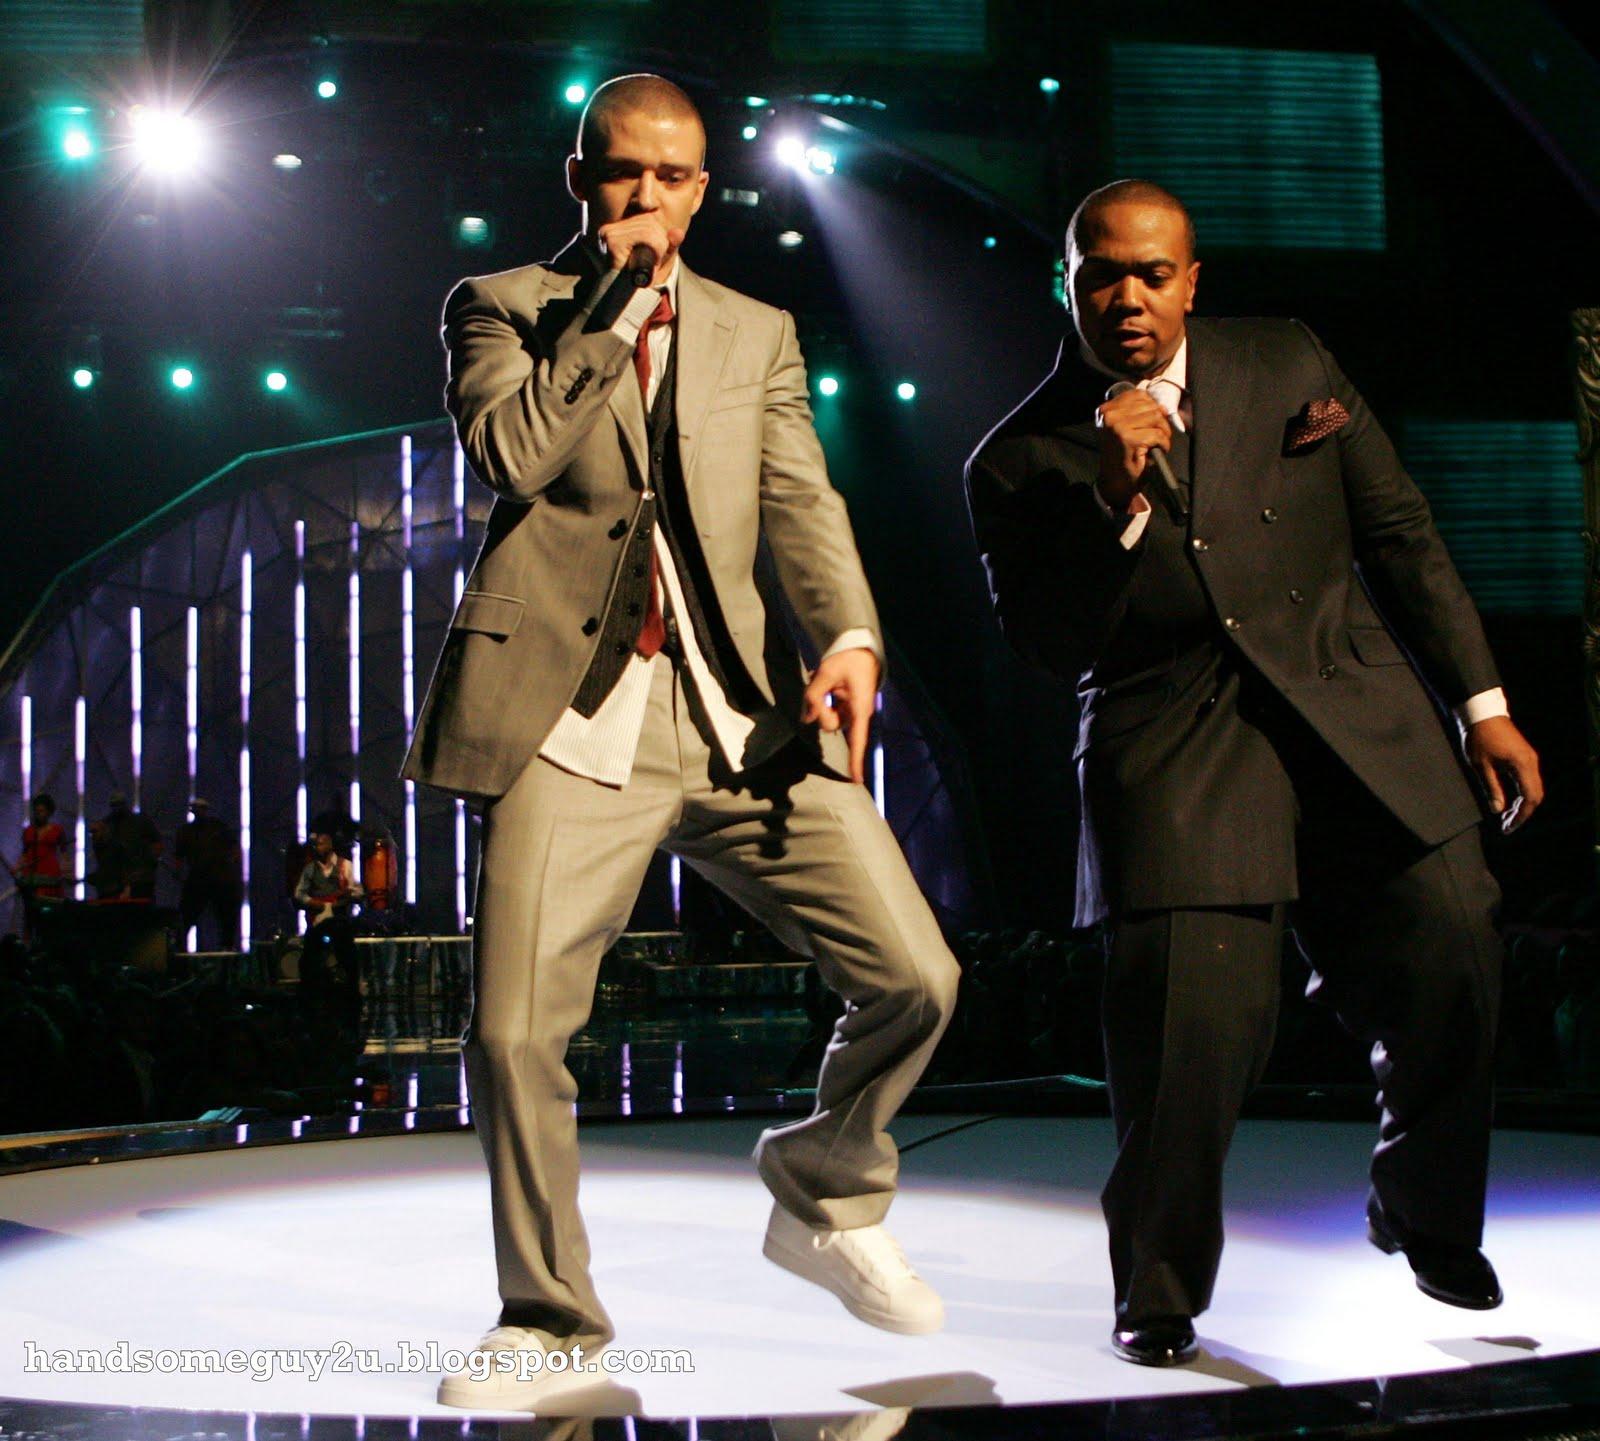 http://3.bp.blogspot.com/_rVJ5MmyyJR0/S9GA04ME44I/AAAAAAAAA88/uijS9kXNxxI/s1600/Justin+Timberlake+6.jpg